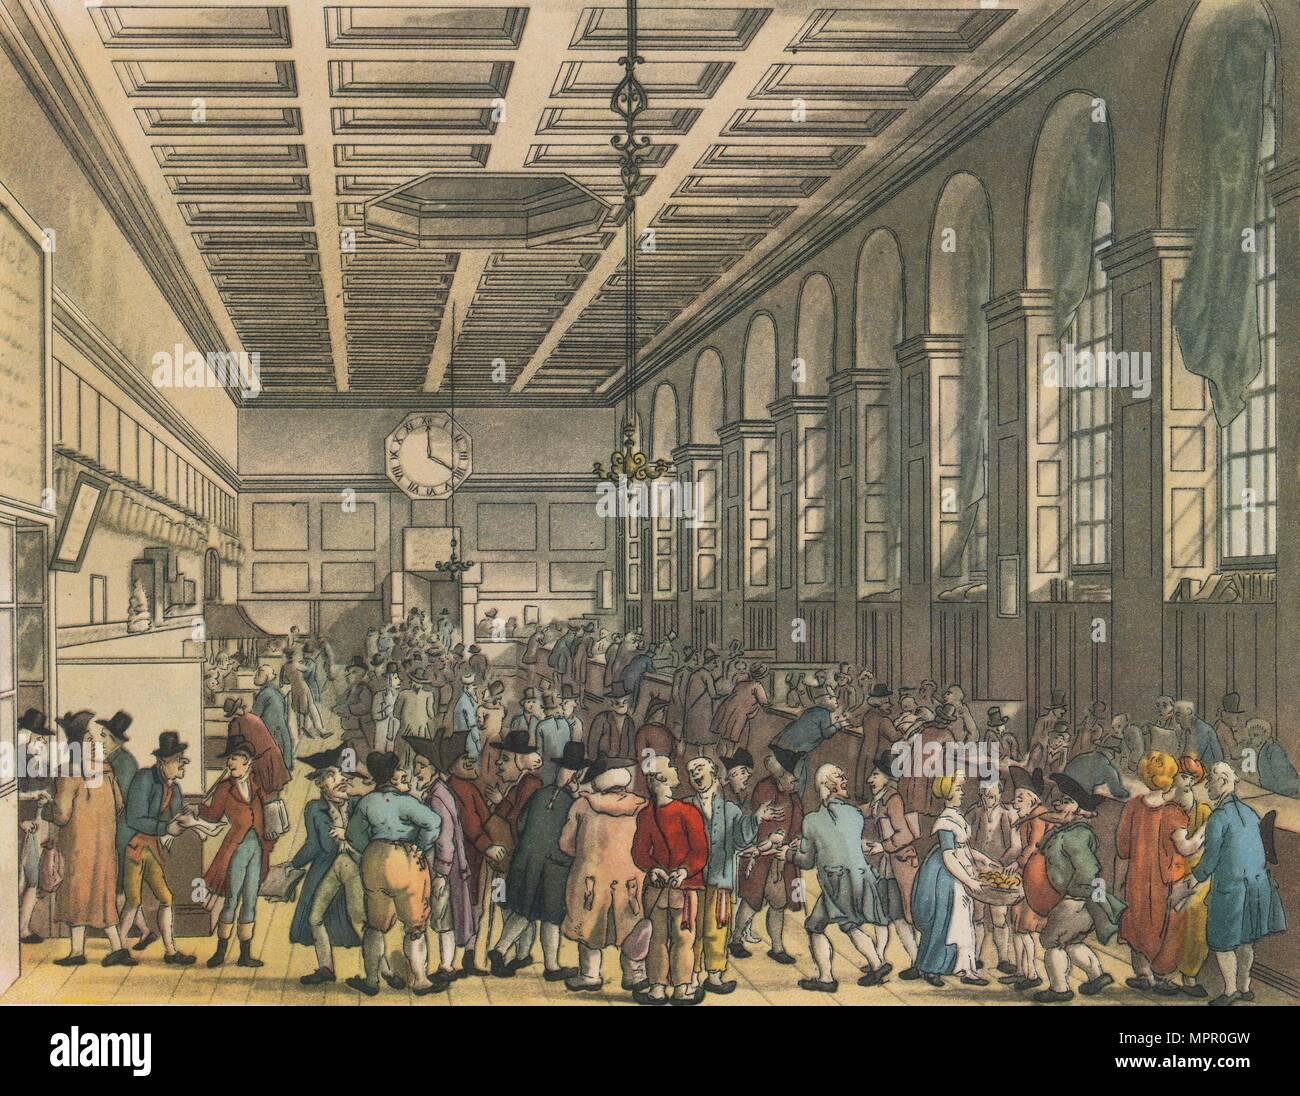 Interior of Custom House, London, 1808. Artists: Augustus Charles Pugin, Thomas Rowlandson. - Stock Image